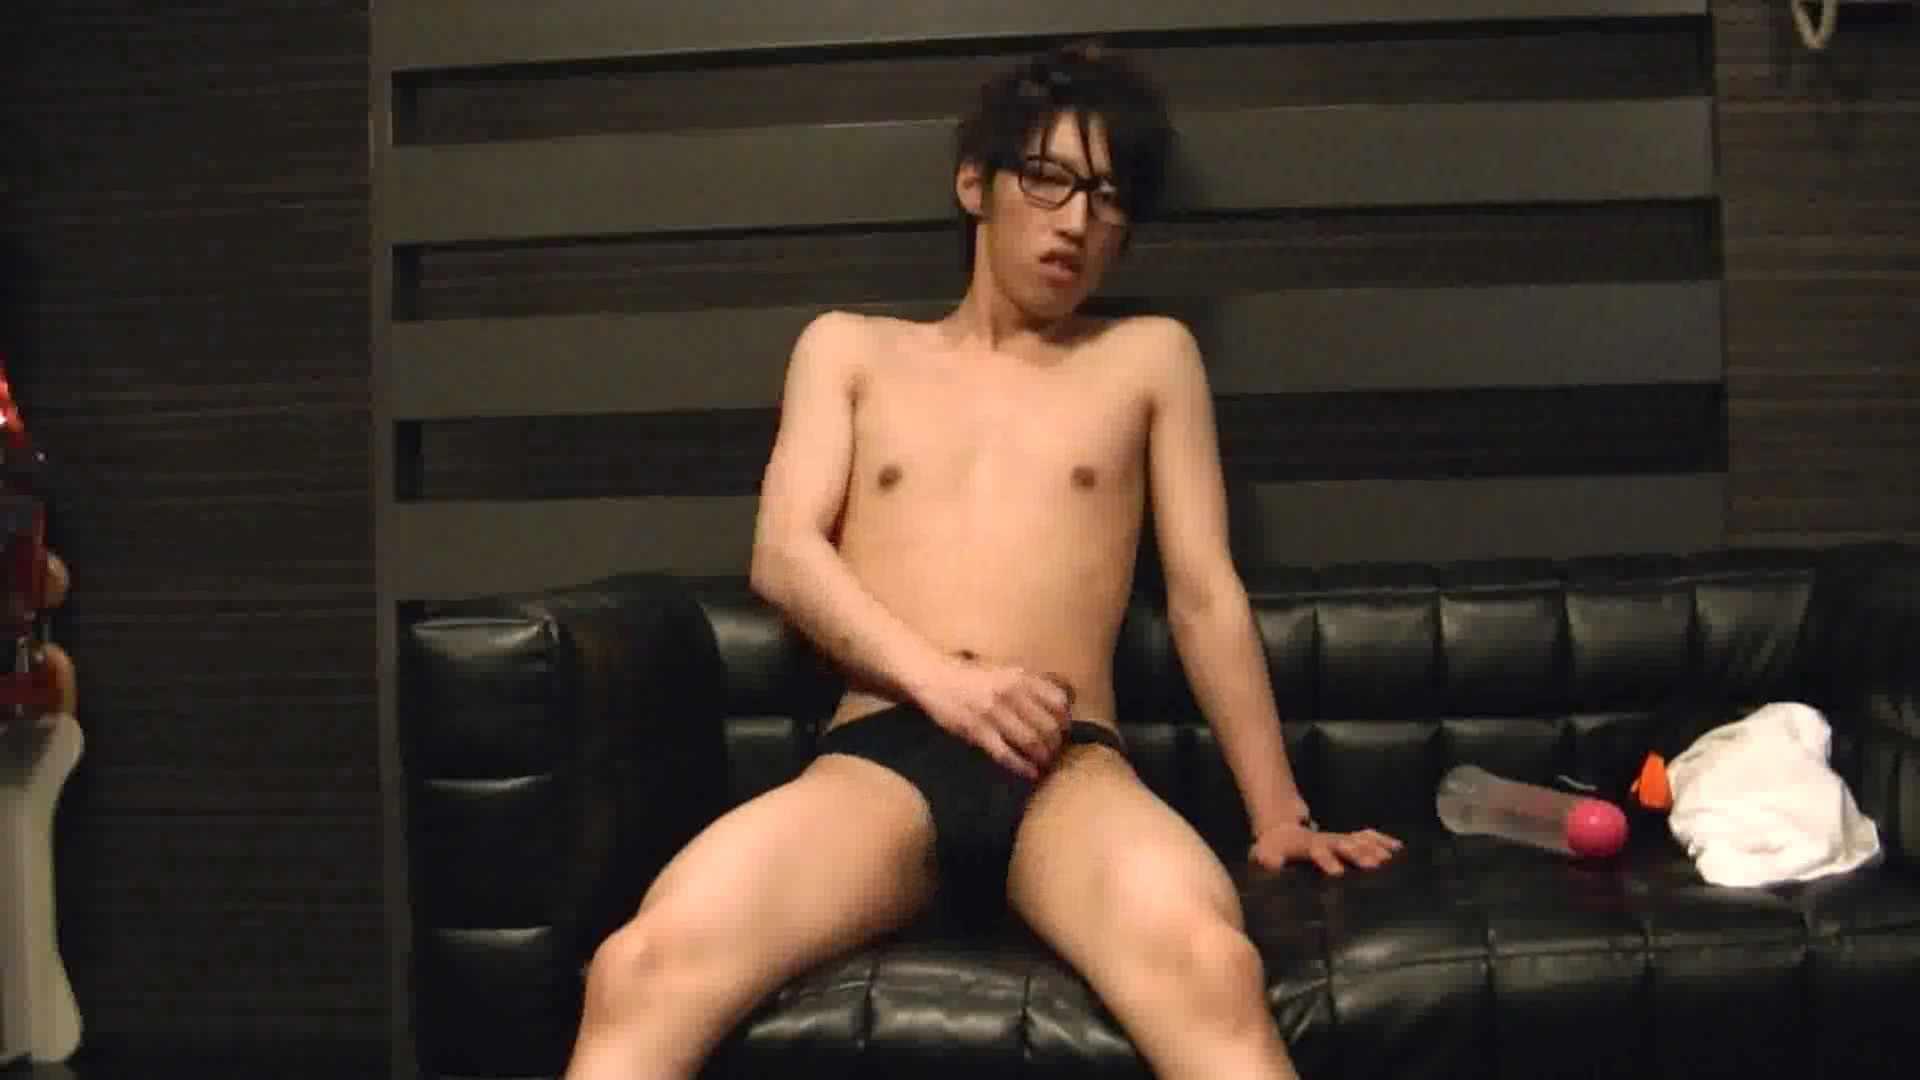 ONA見せカーニバル!! Vol3 男 ゲイ無料無修正画像 89枚 43